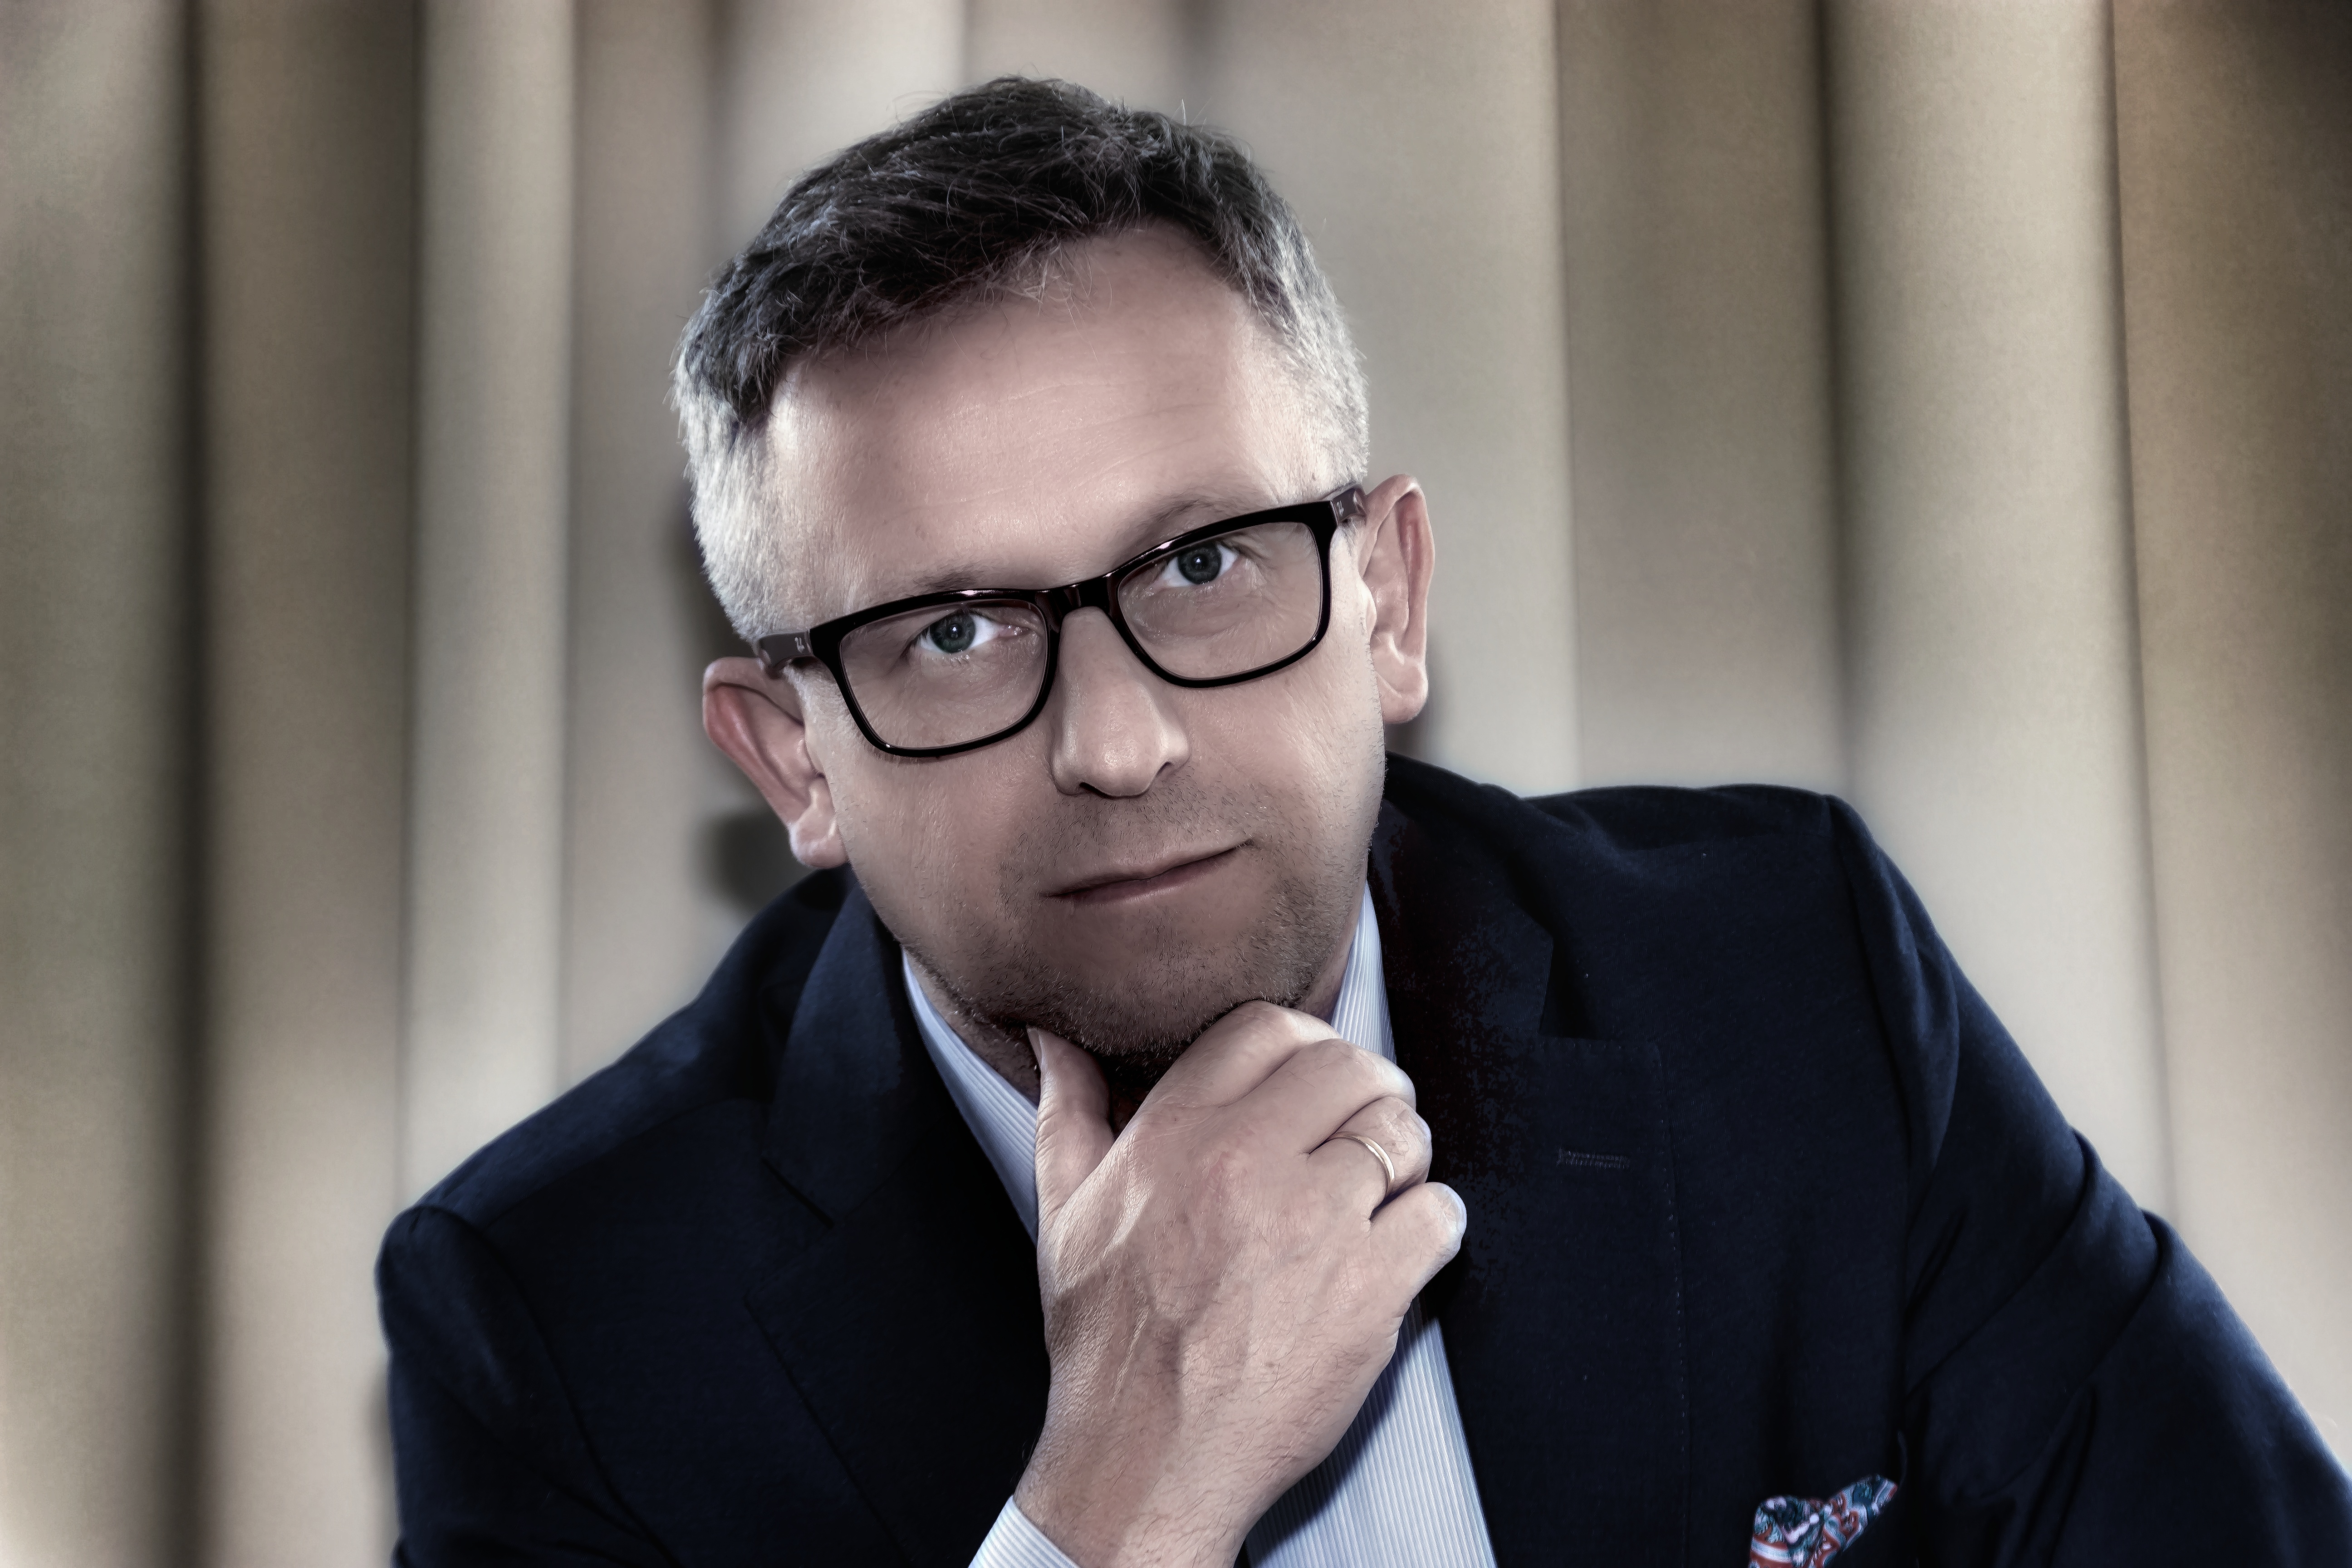 Tomasz Ziemann